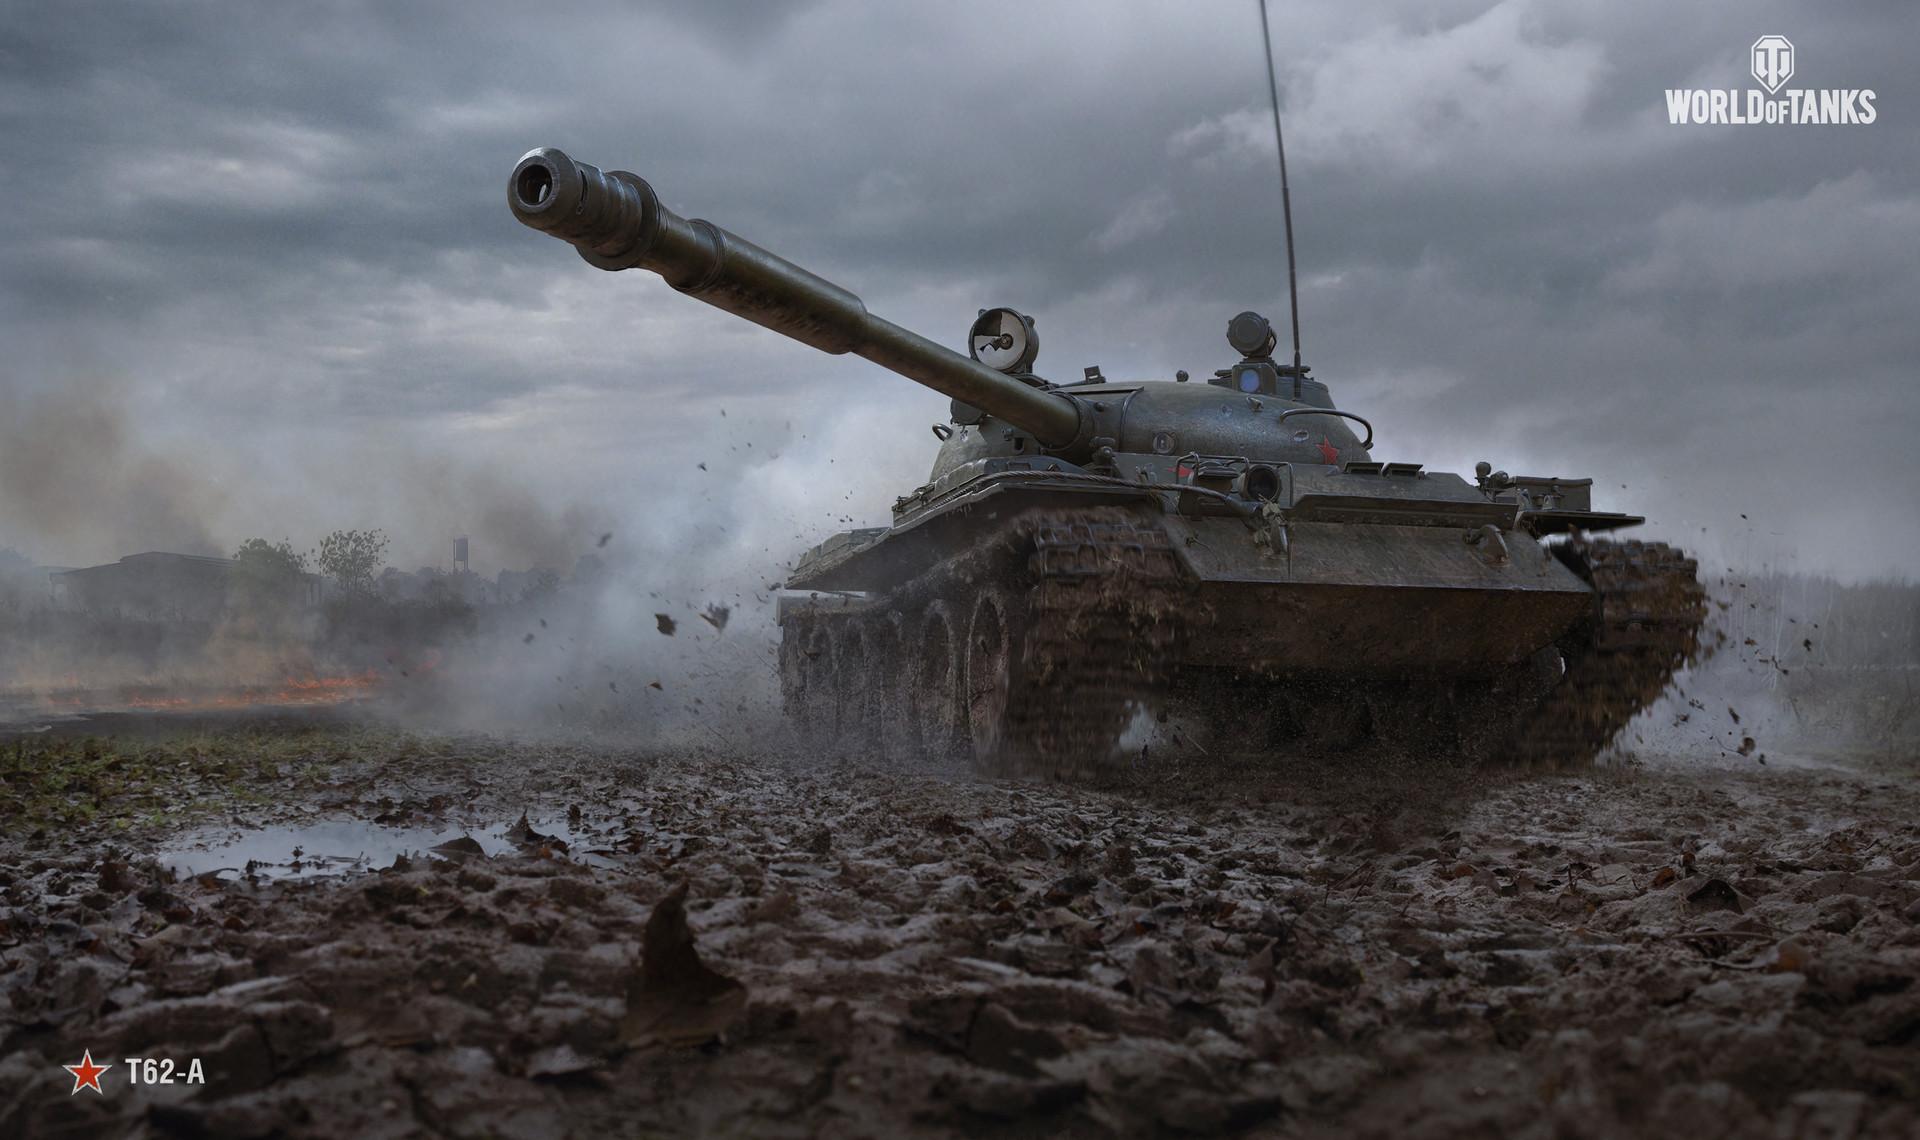 eugene-valyntsevich-t-62a-fin-2560